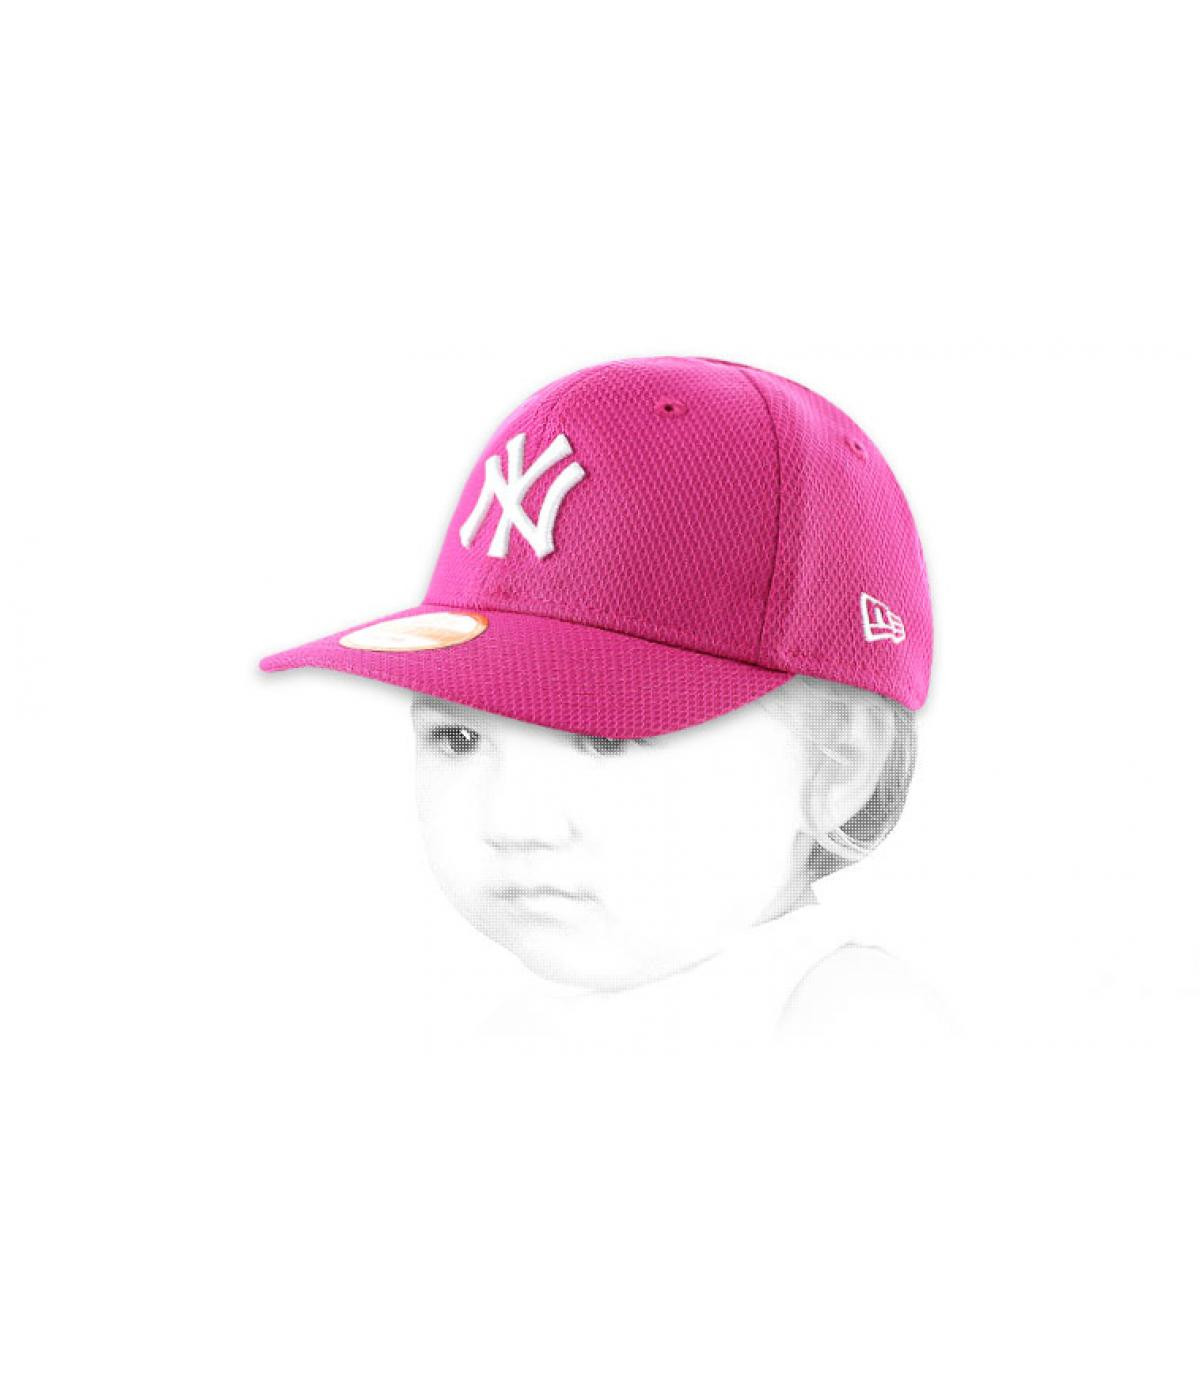 Pink NY cap kids